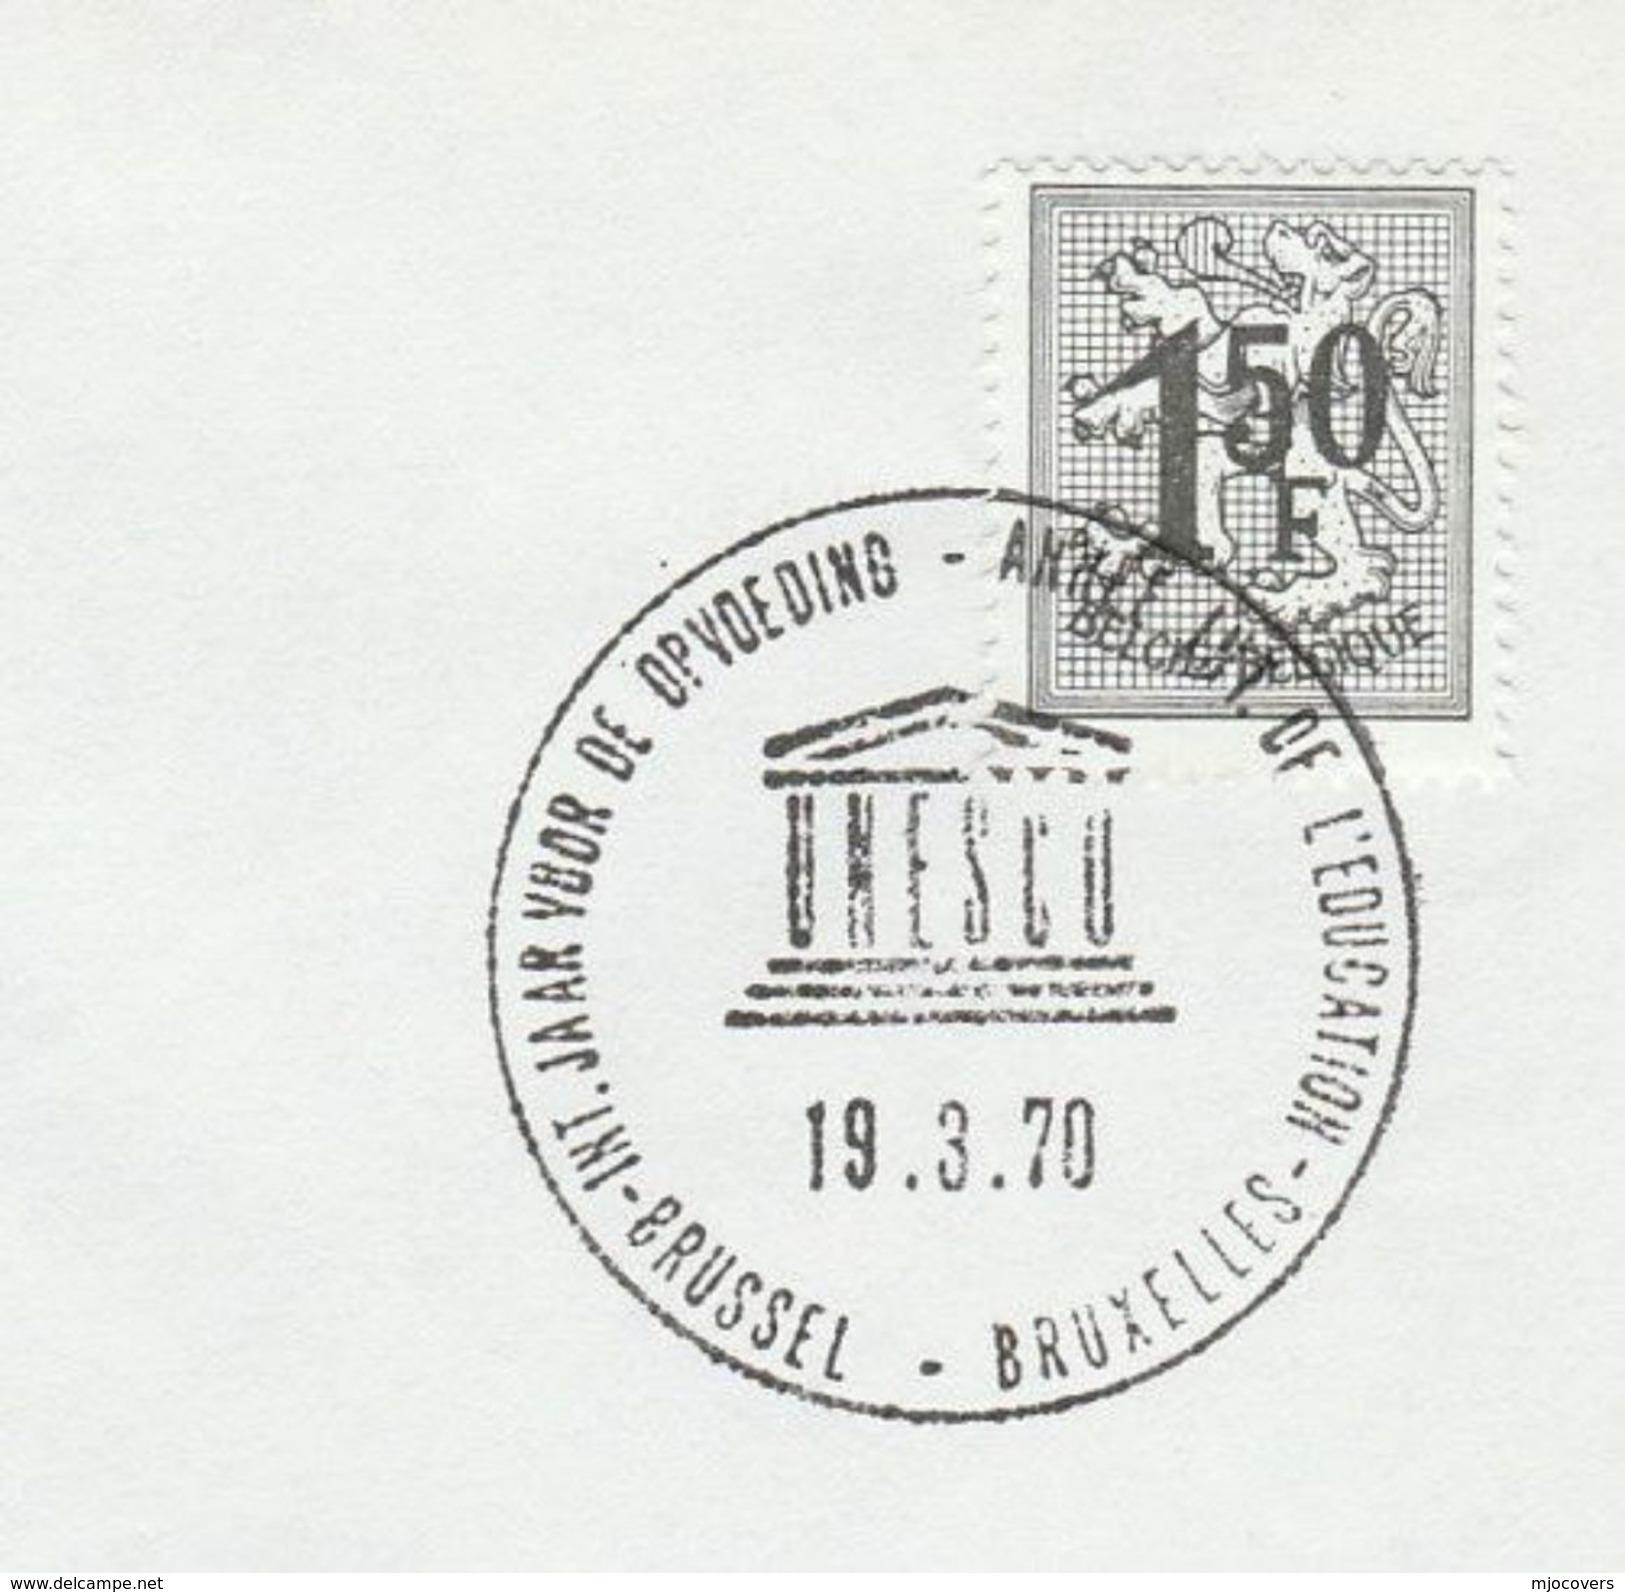 1970 BELGIUM UNESCO EVENT COVER International EDUCATION YEAR Un United Nations Stamps - UNESCO